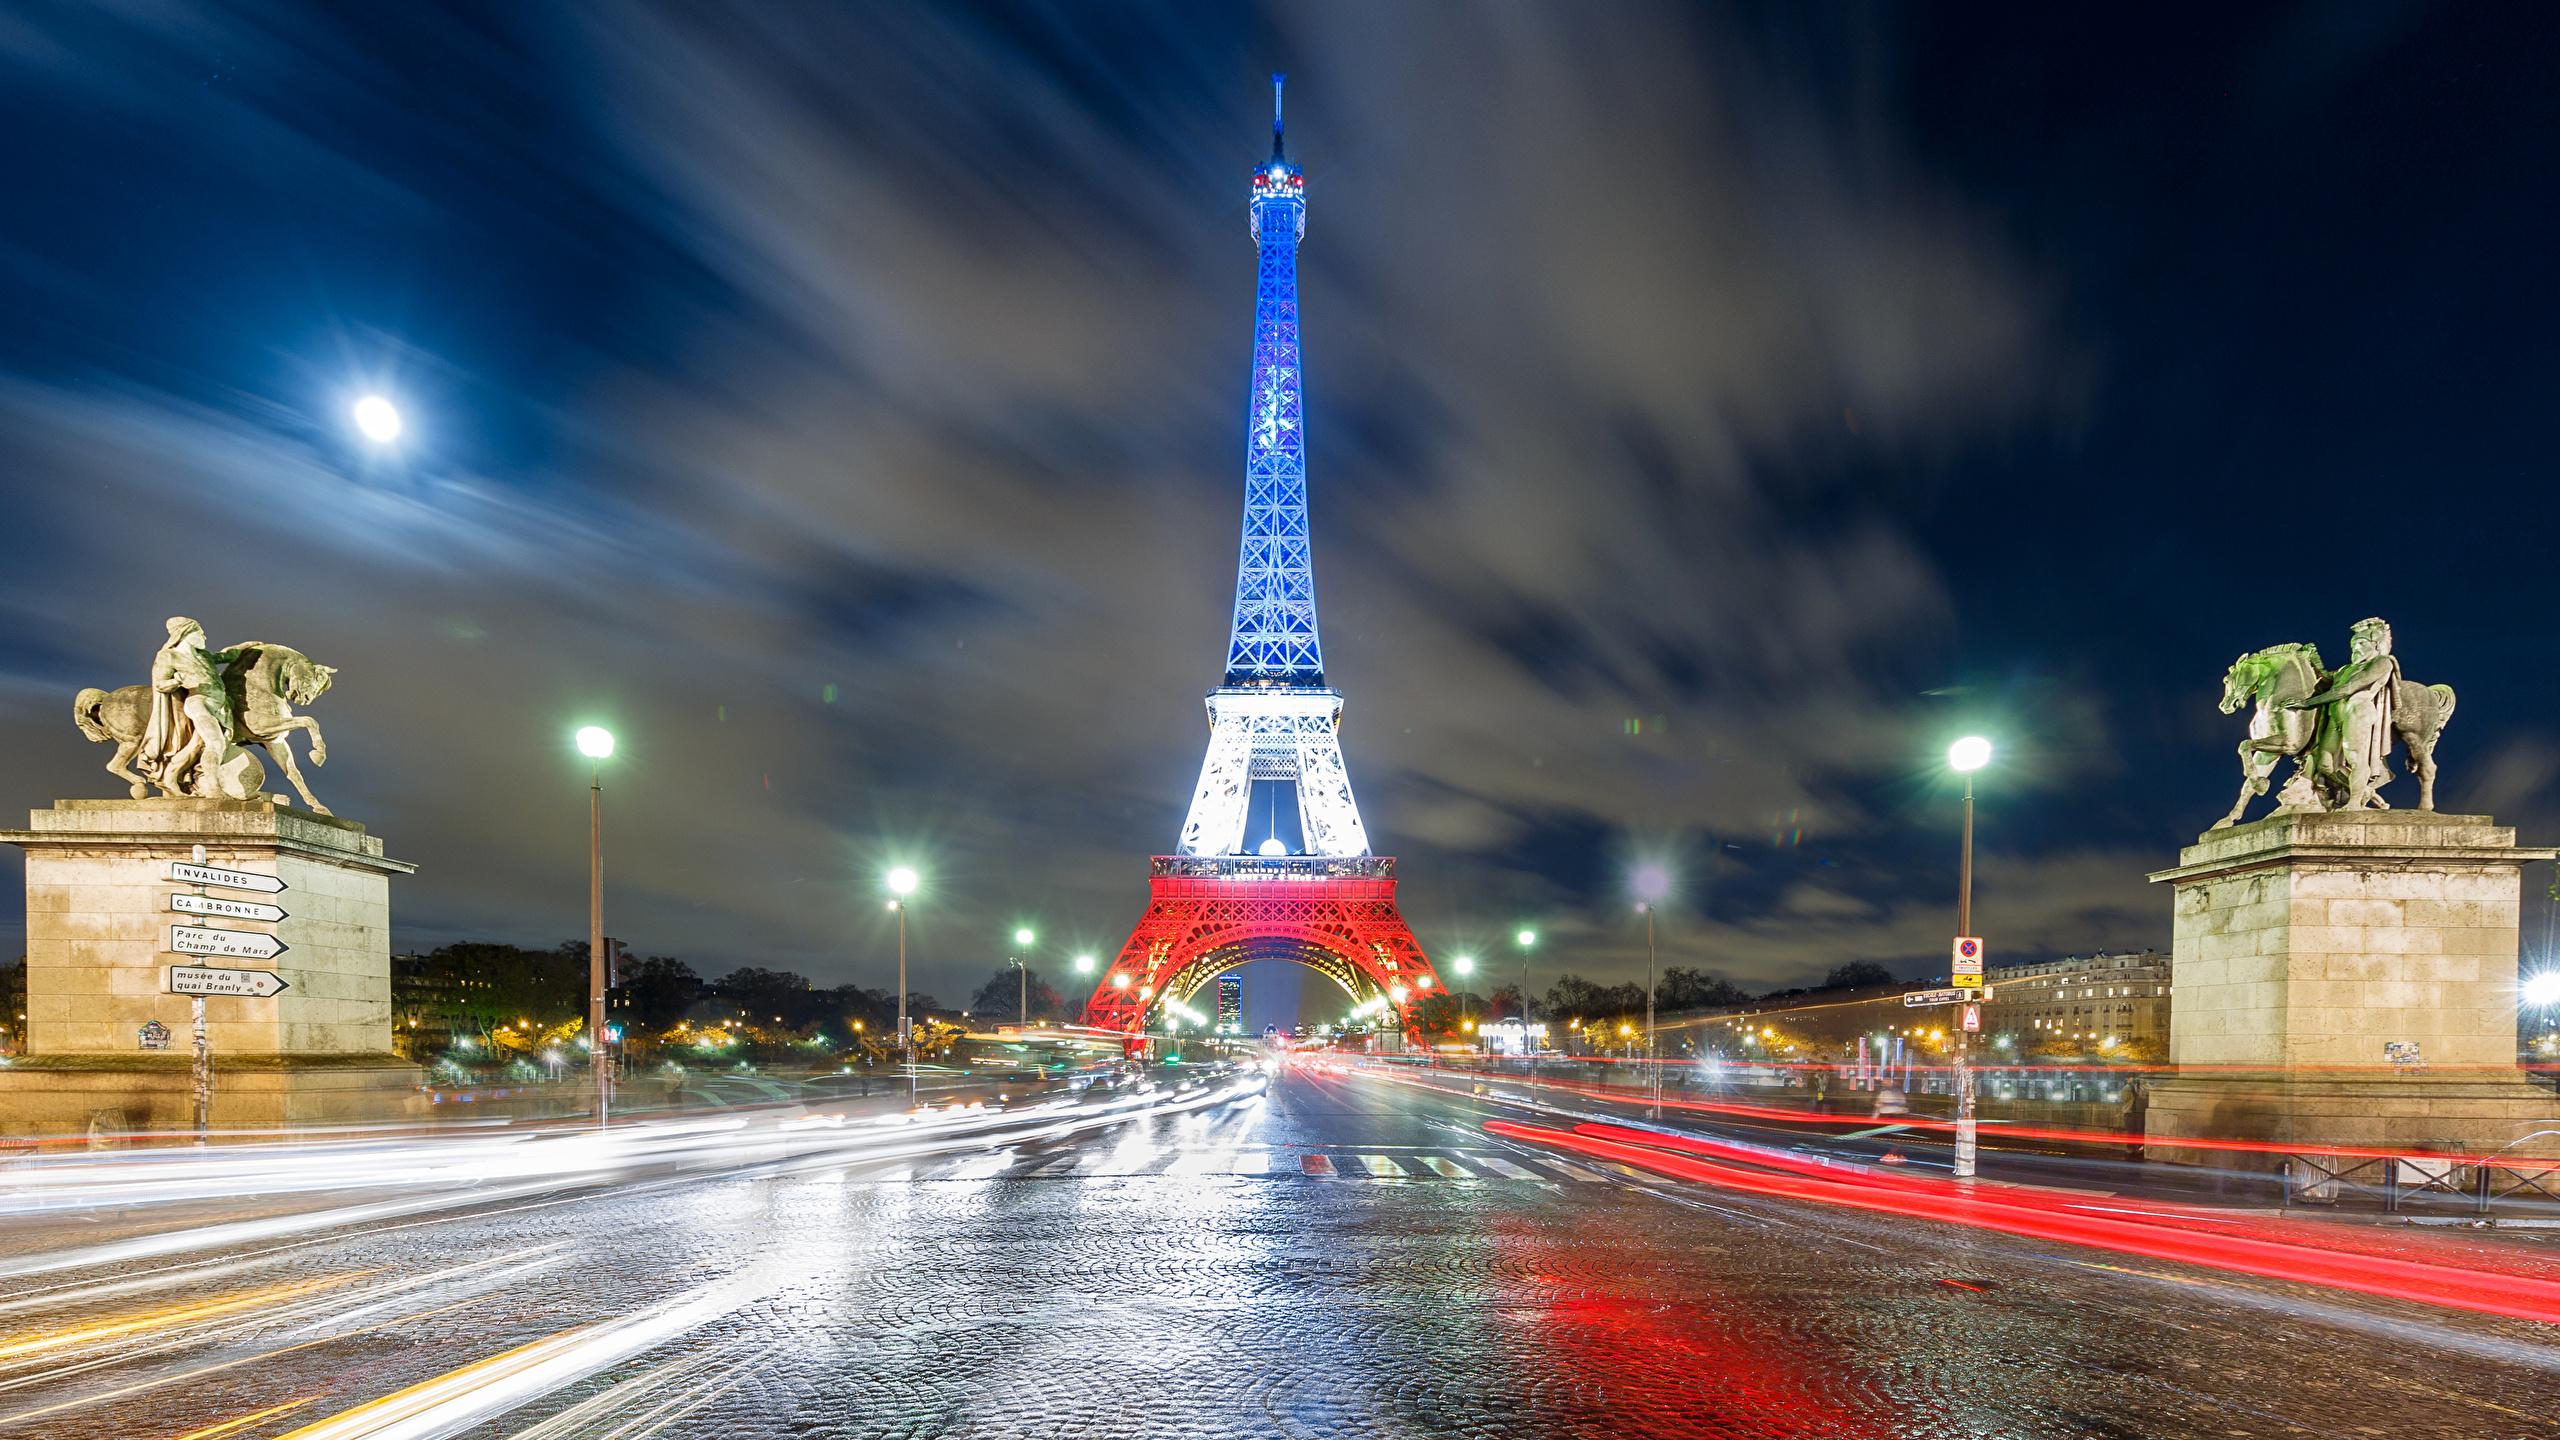 Франция дороги ночь фонари  № 2229241 бесплатно